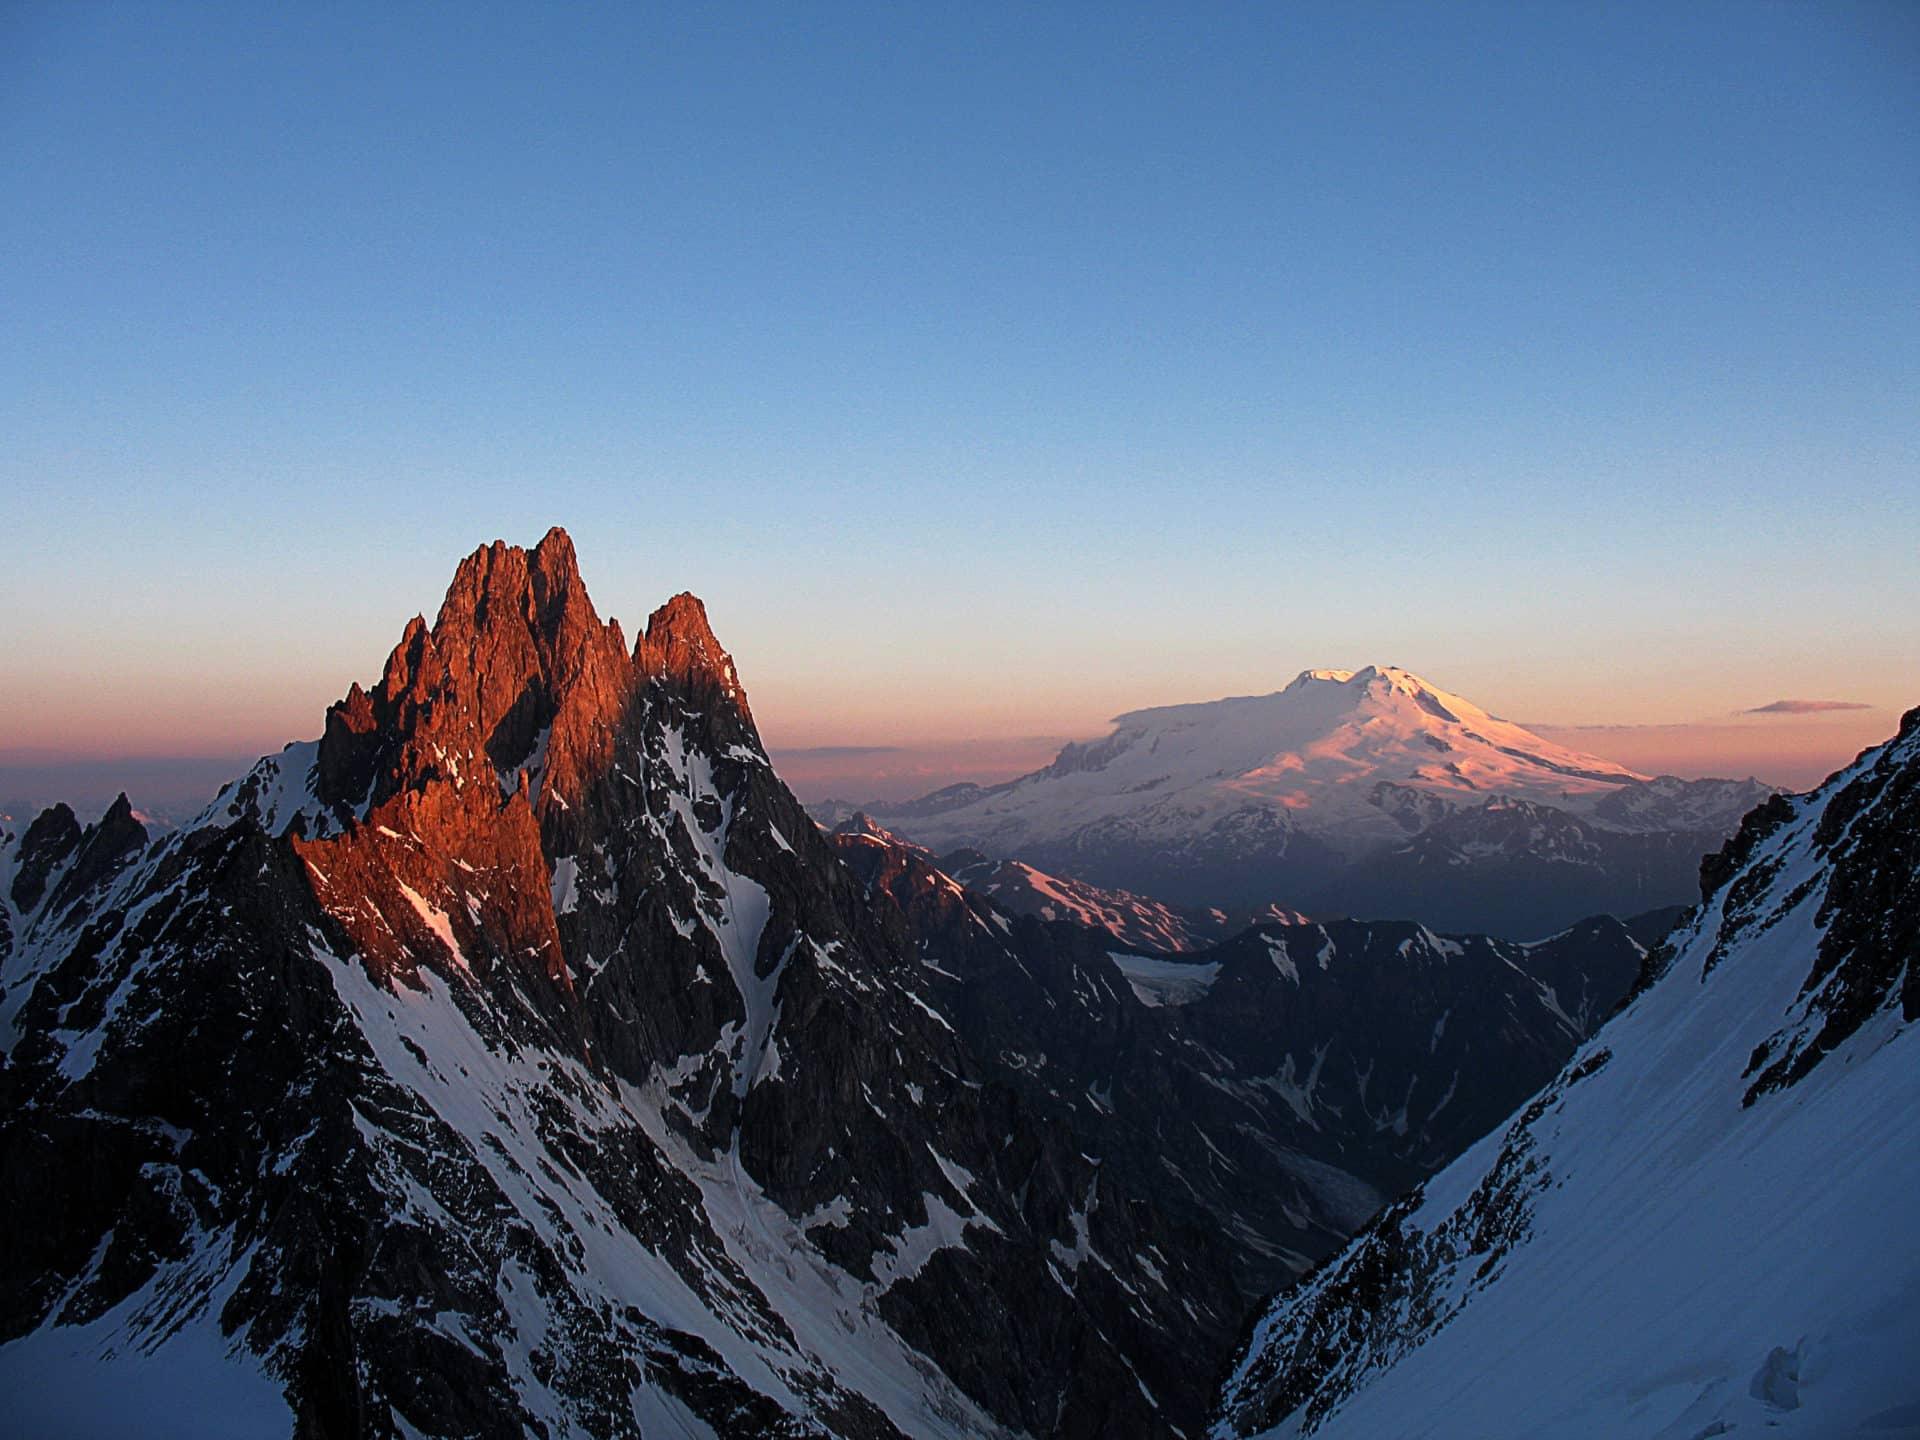 Mt Elbrus Ascent from Terskol. 6-day trip. IFMGA leader